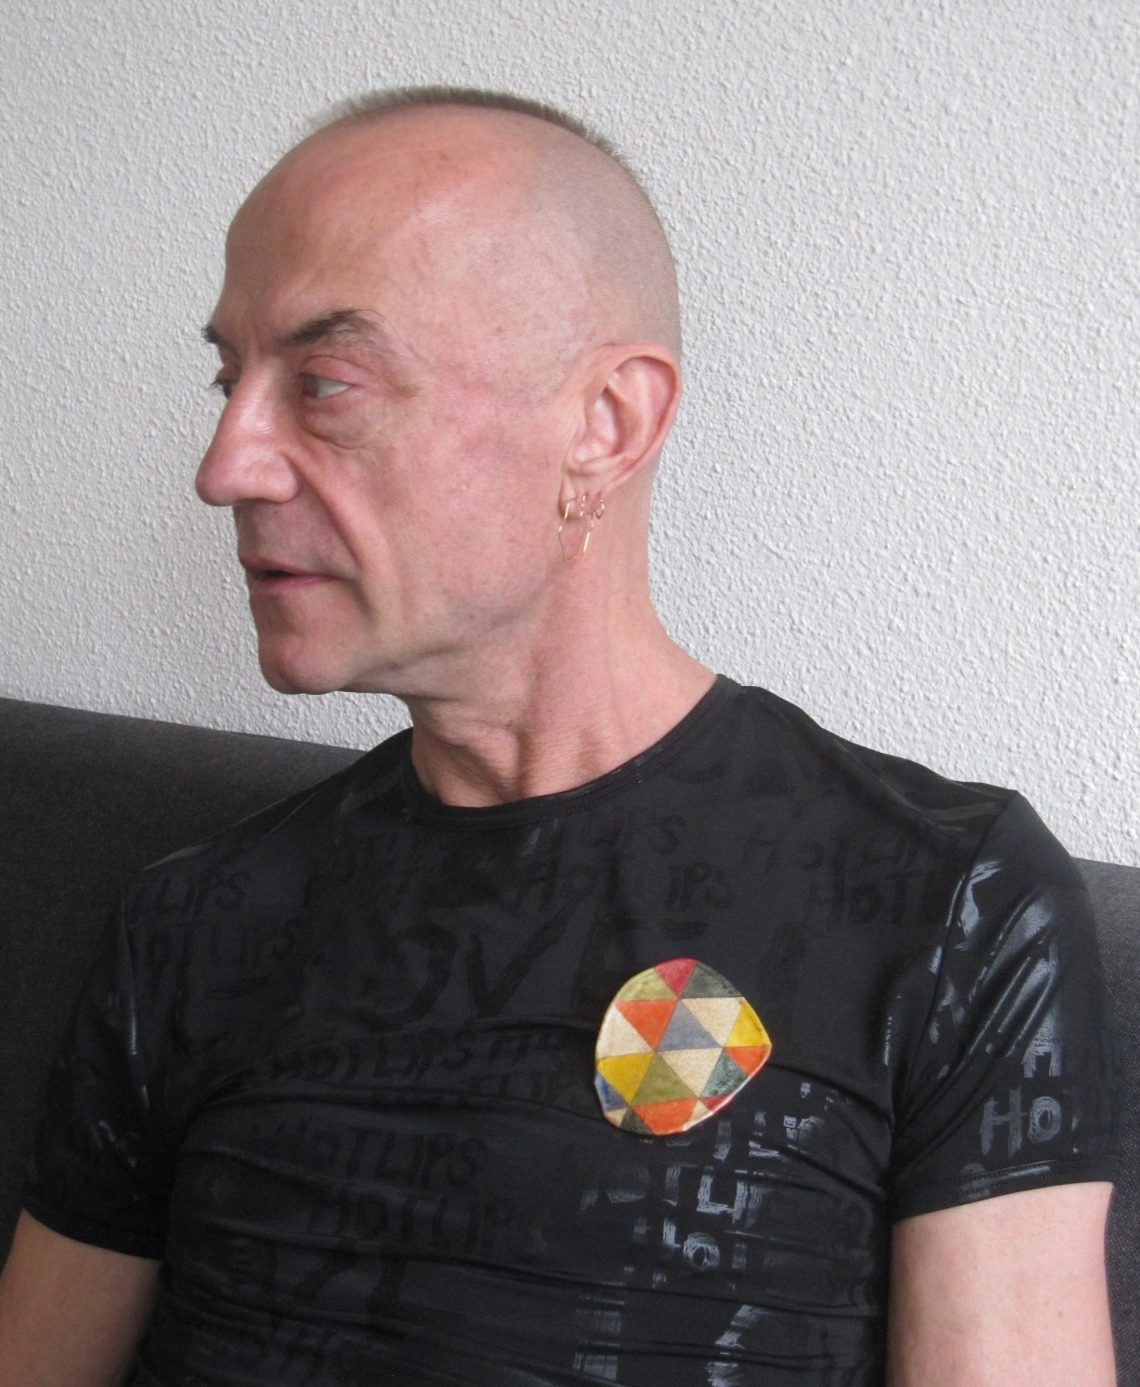 Jeldrik Oorthuys draagt Iene Ambars Letters to my Friends, Foto met dank aan Iene Ambar©